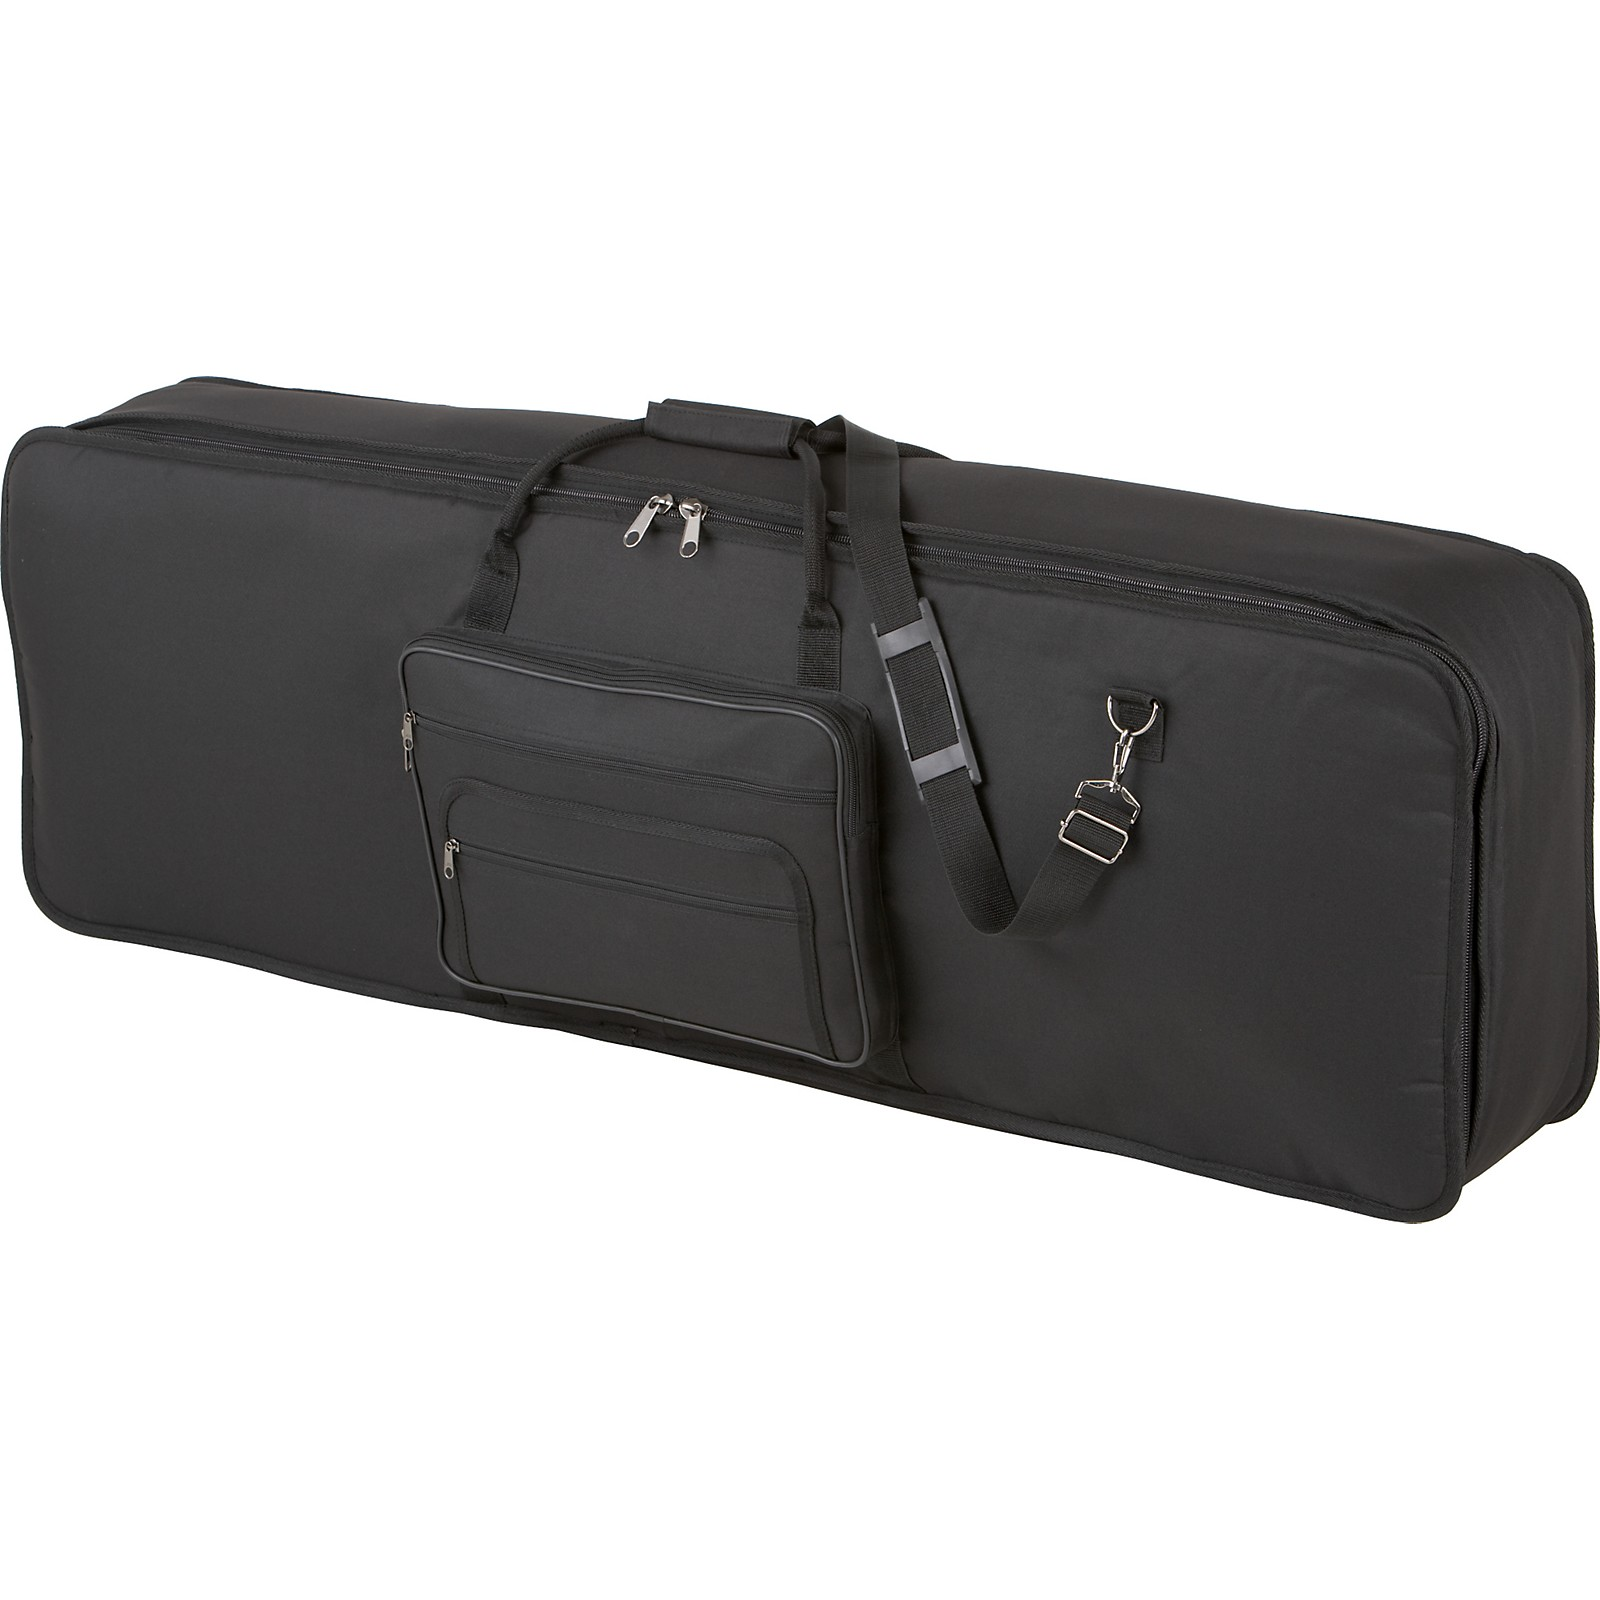 Musician's Gear 76-Key Keyboard Gig Bag